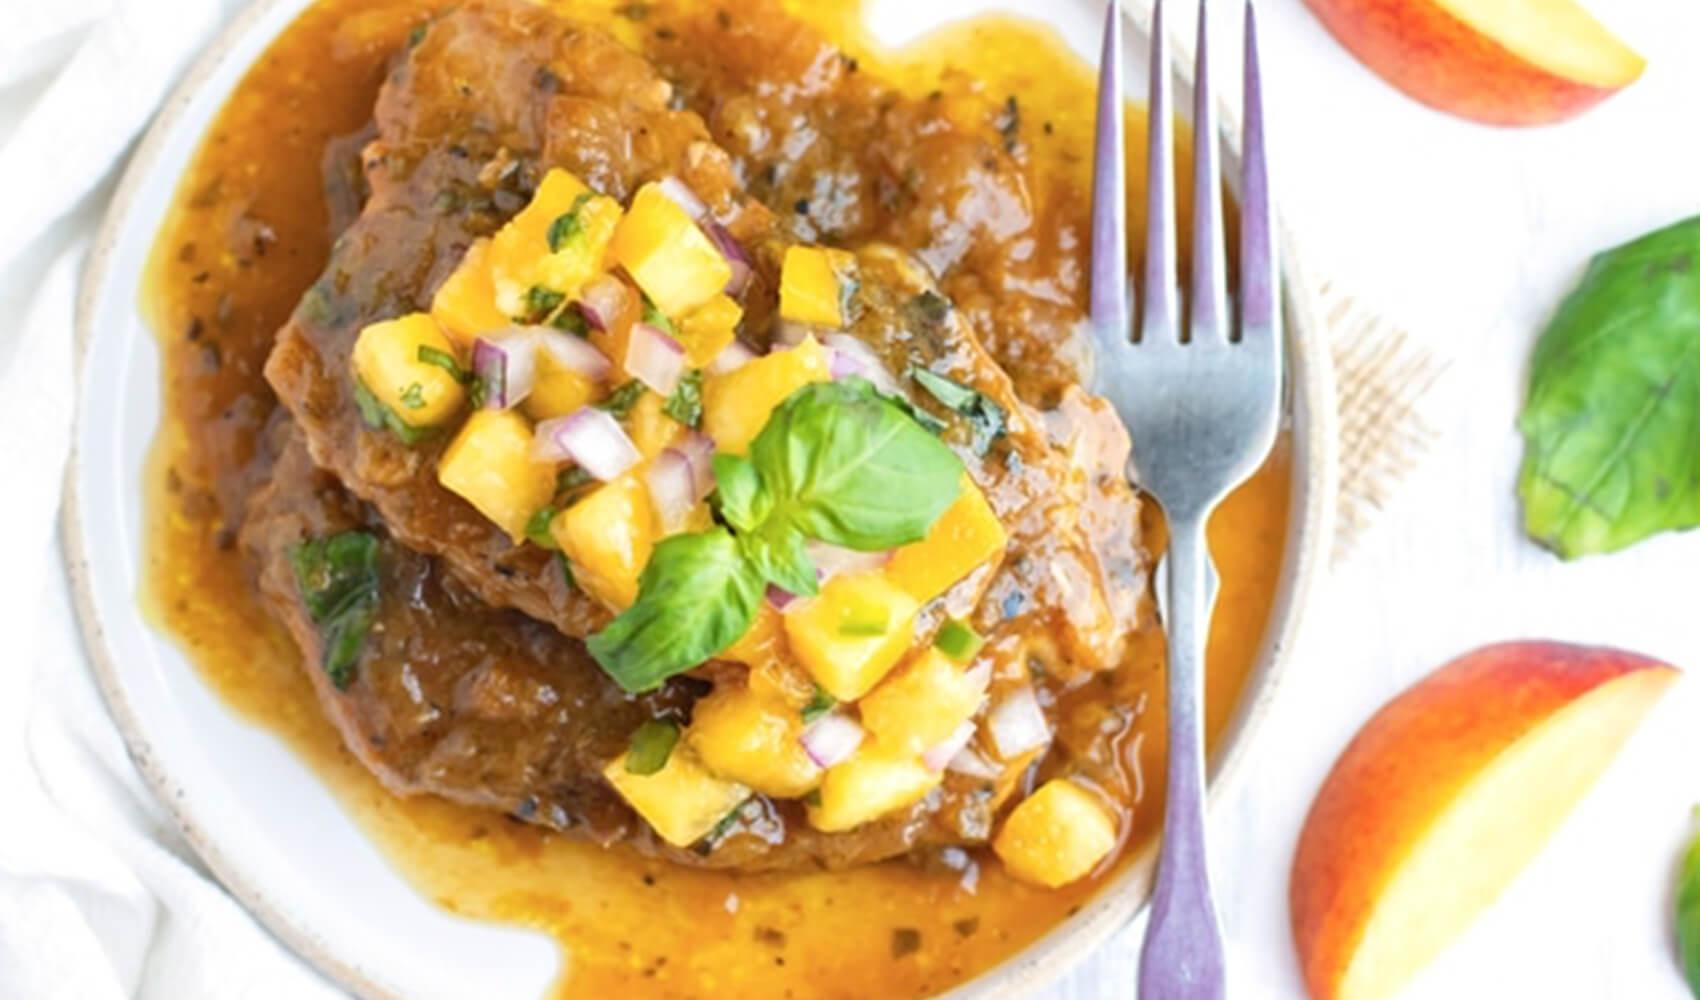 Instant Pot Pork Chops with Peach Salsa